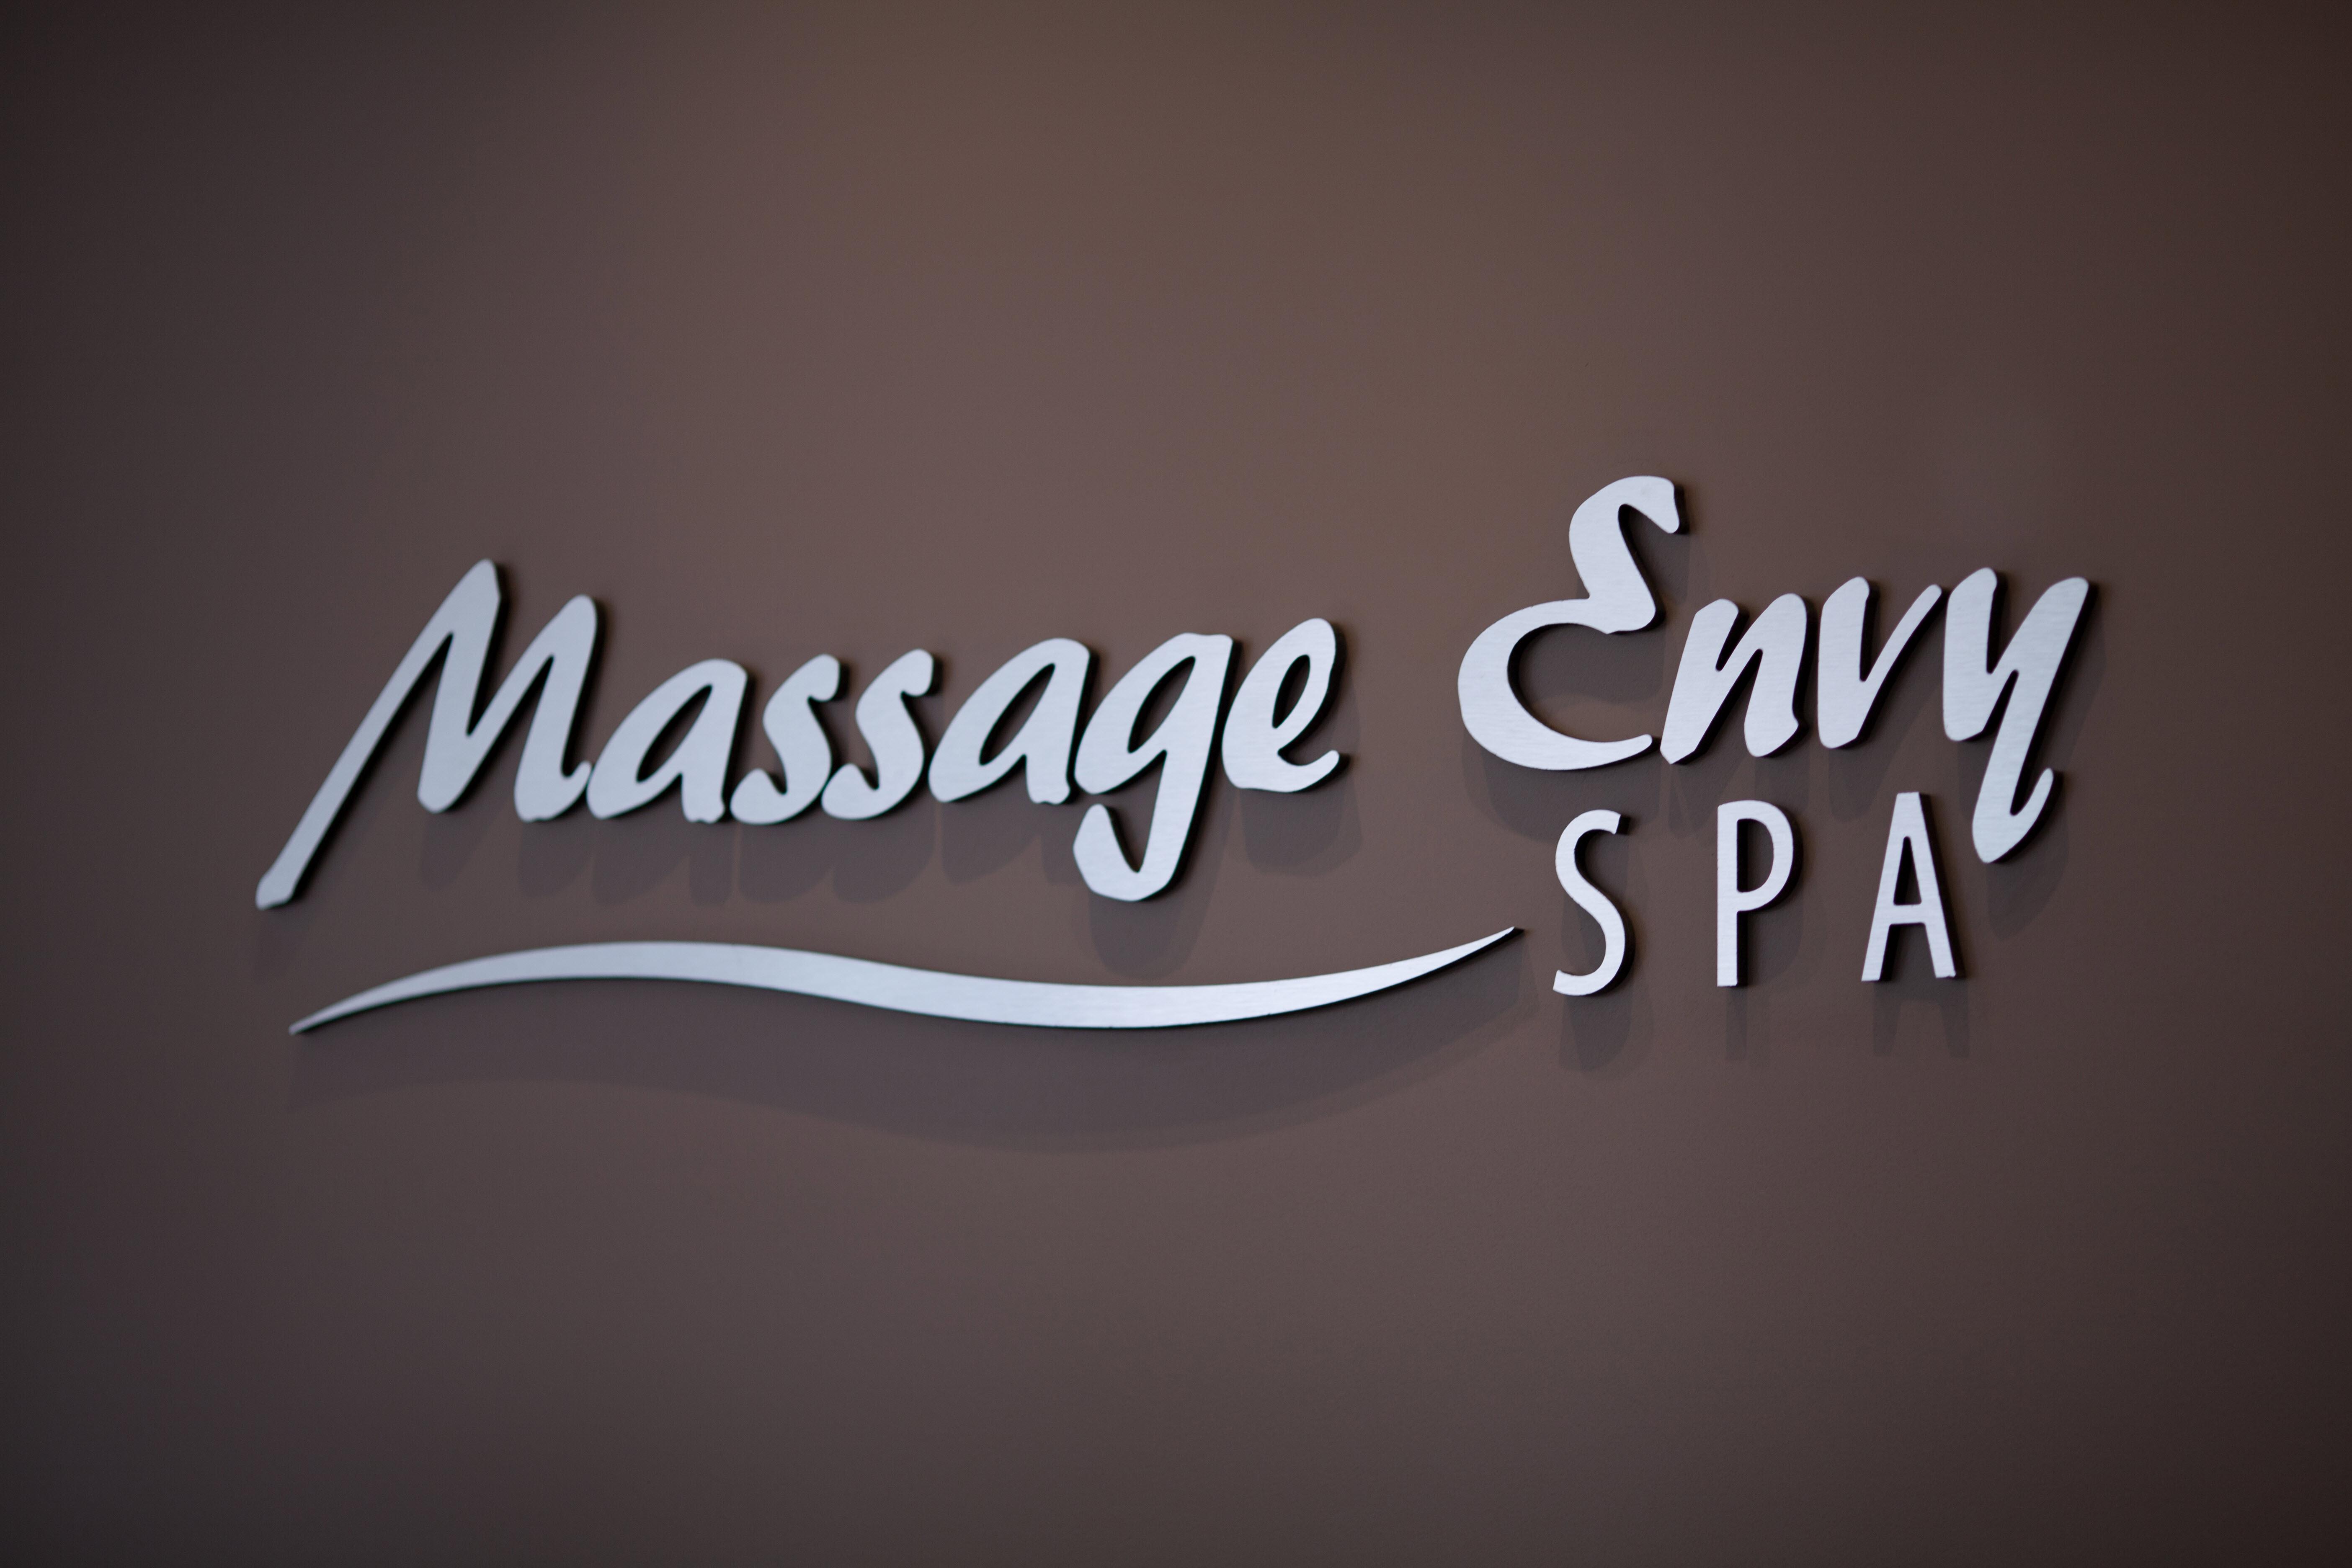 Massage Envy Spa - Fremont